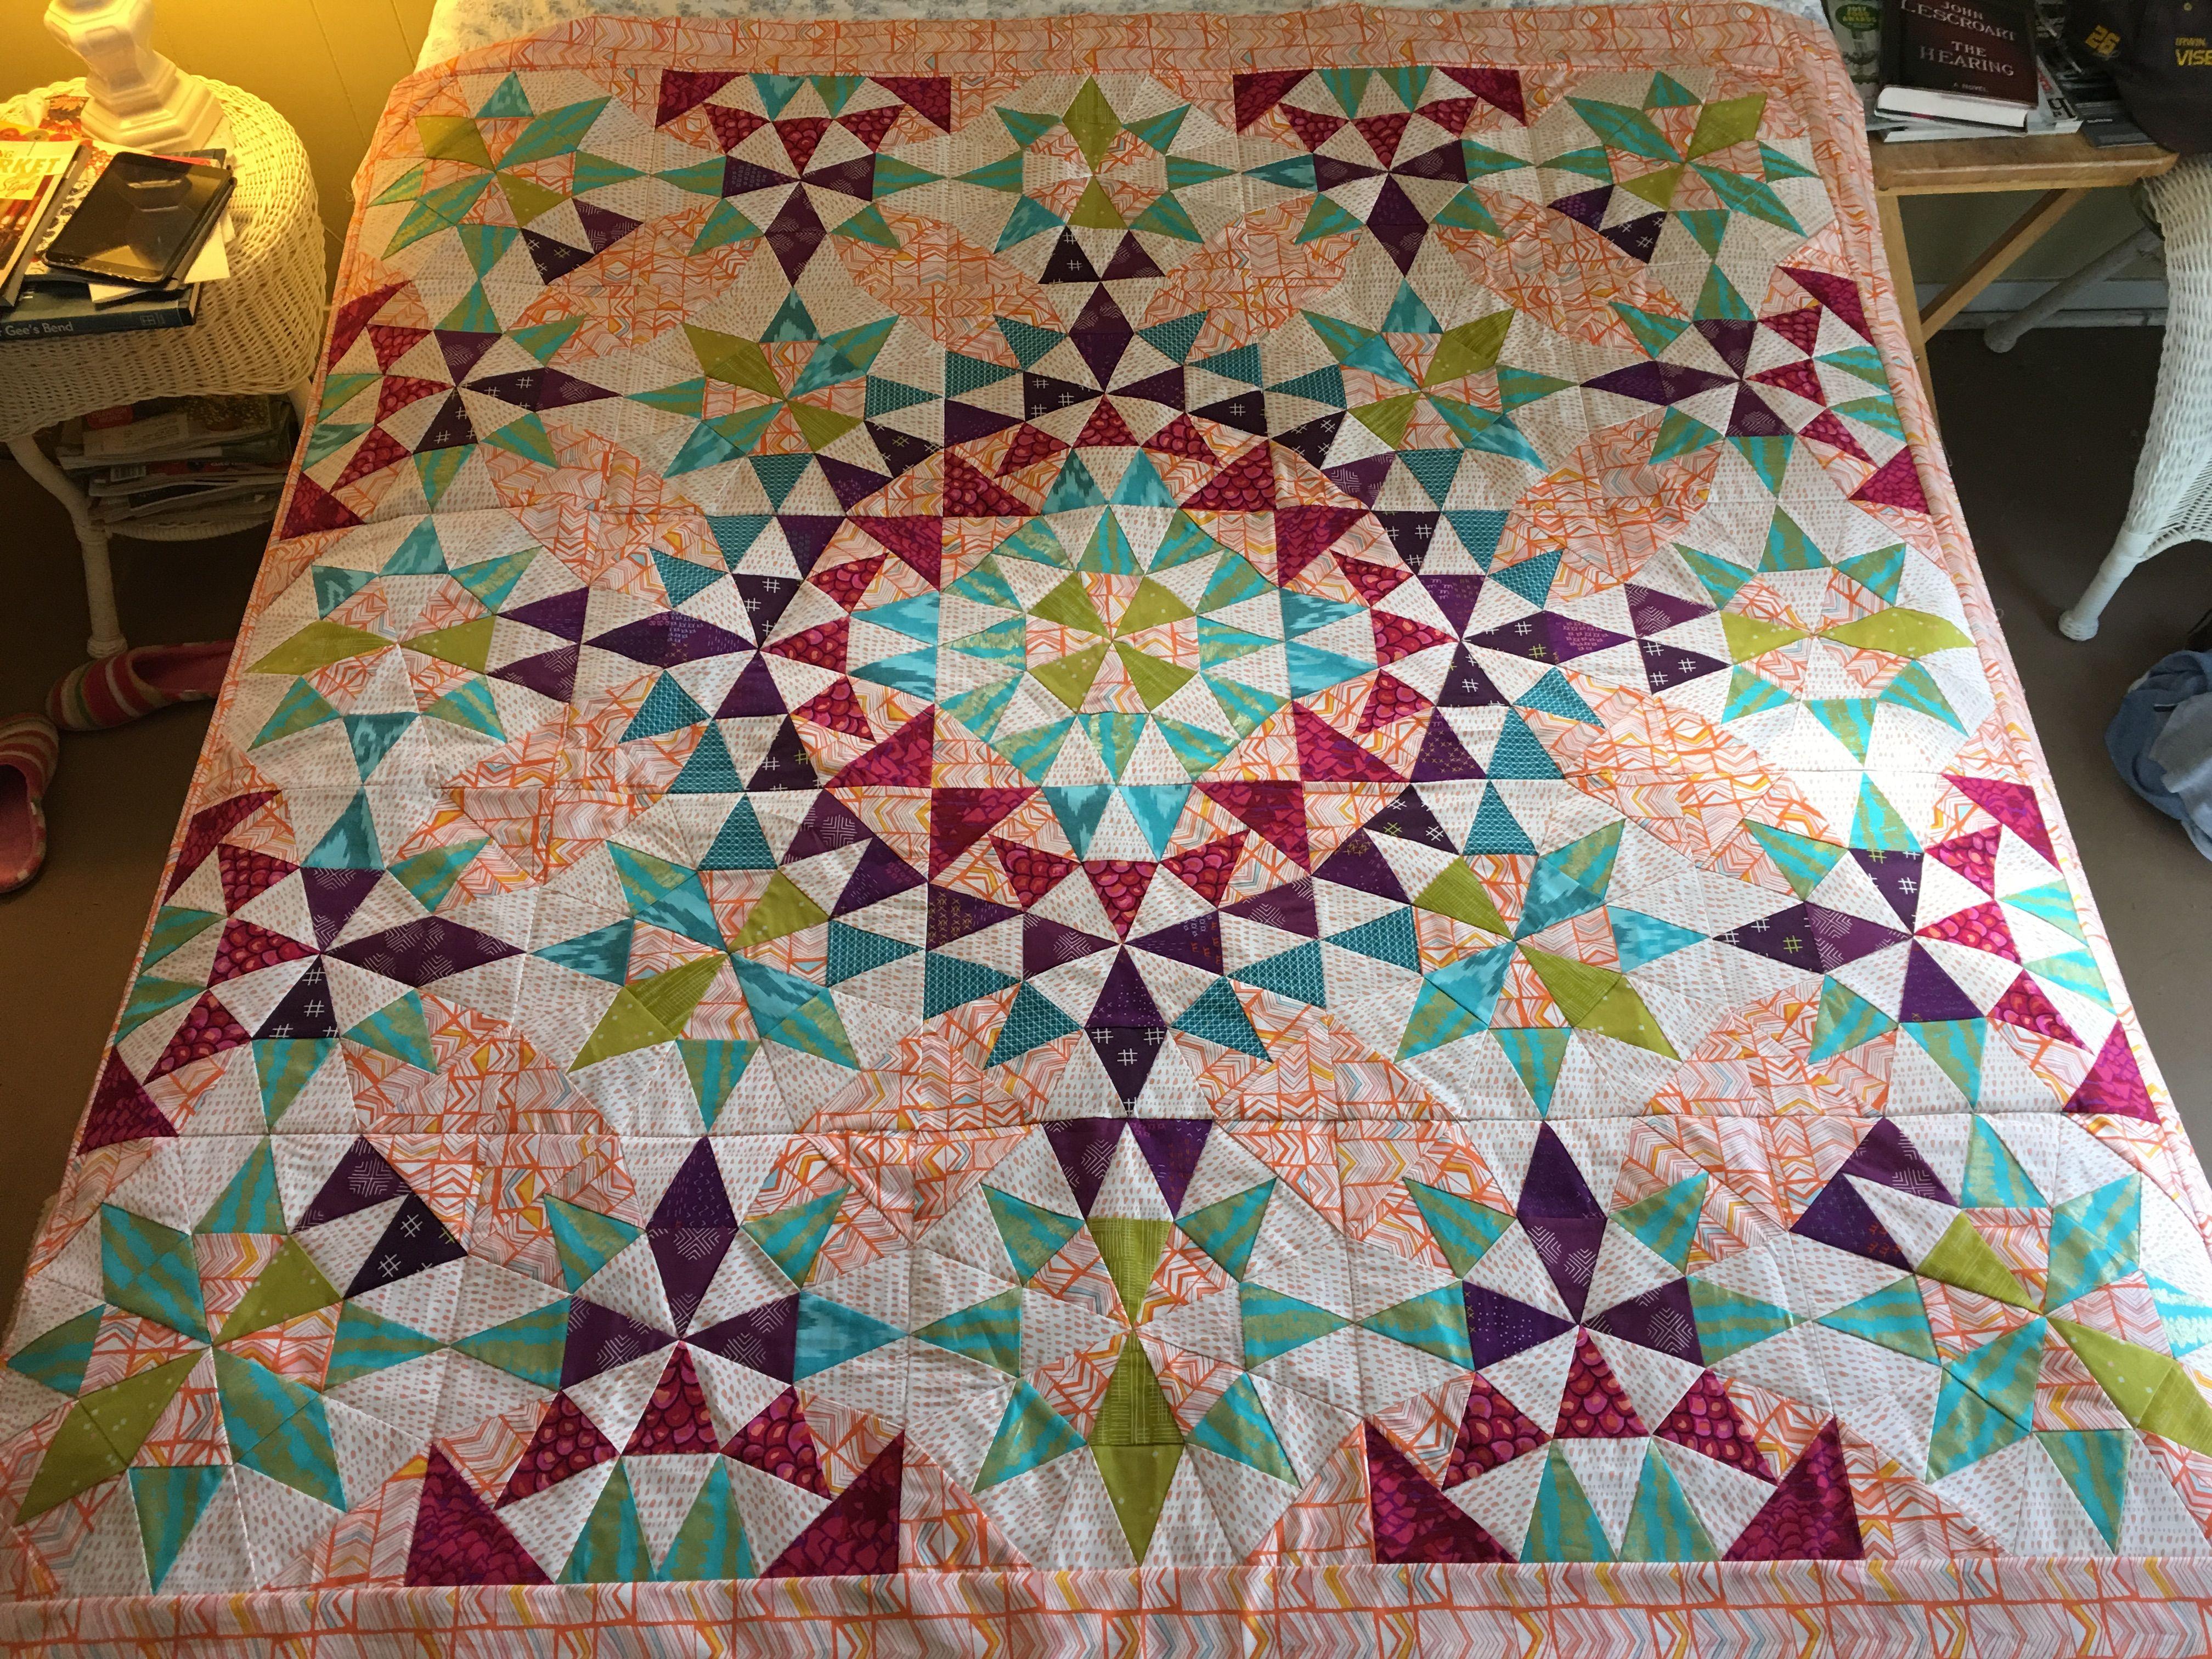 Grandma S Surprise Morning Star Quilt Quilts Kaleidoscope Quilt Star Quilt Patterns